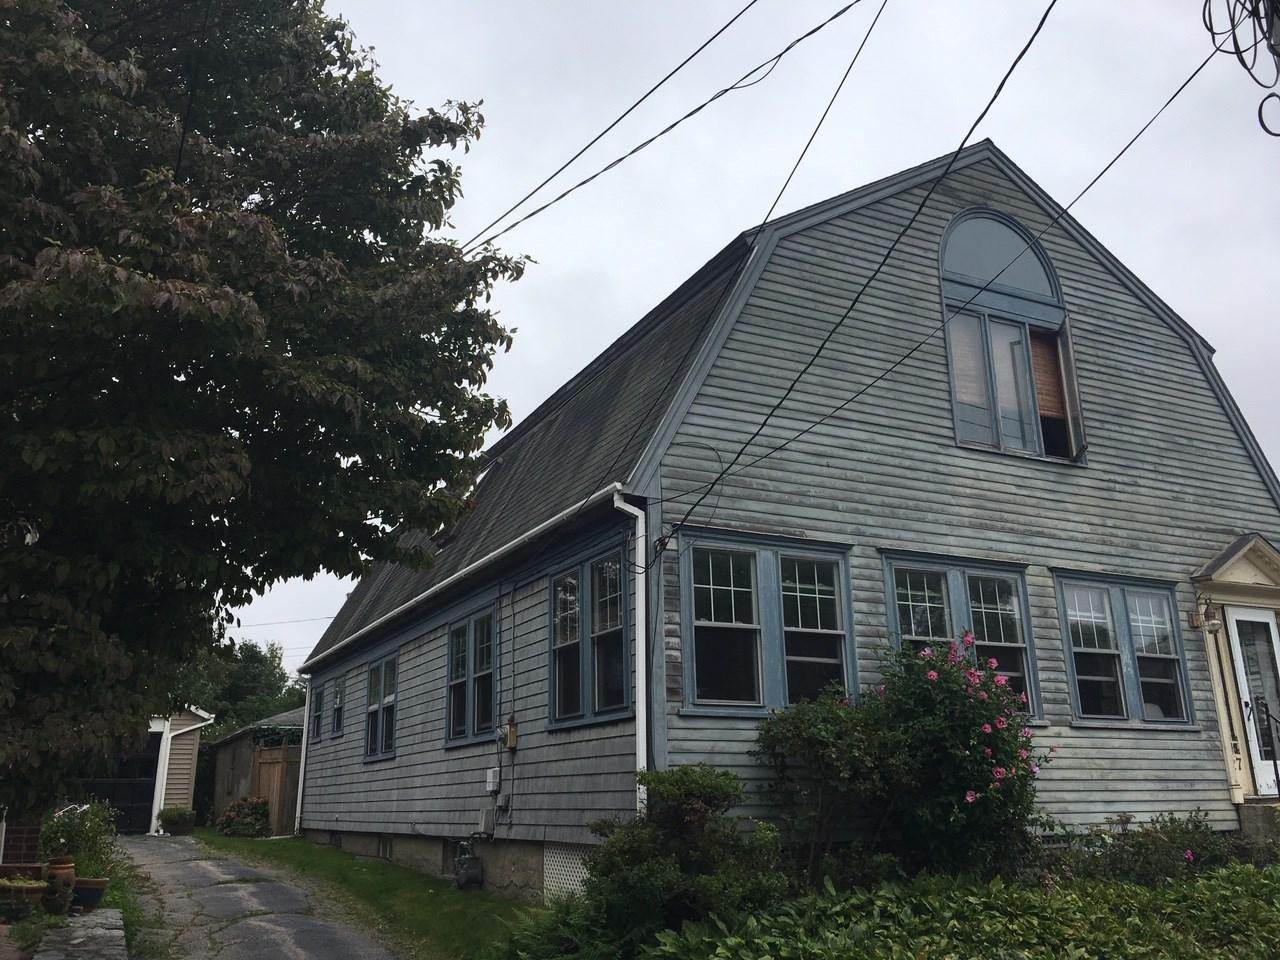 Roof Upgrades Newport, RI Home - Before Photo